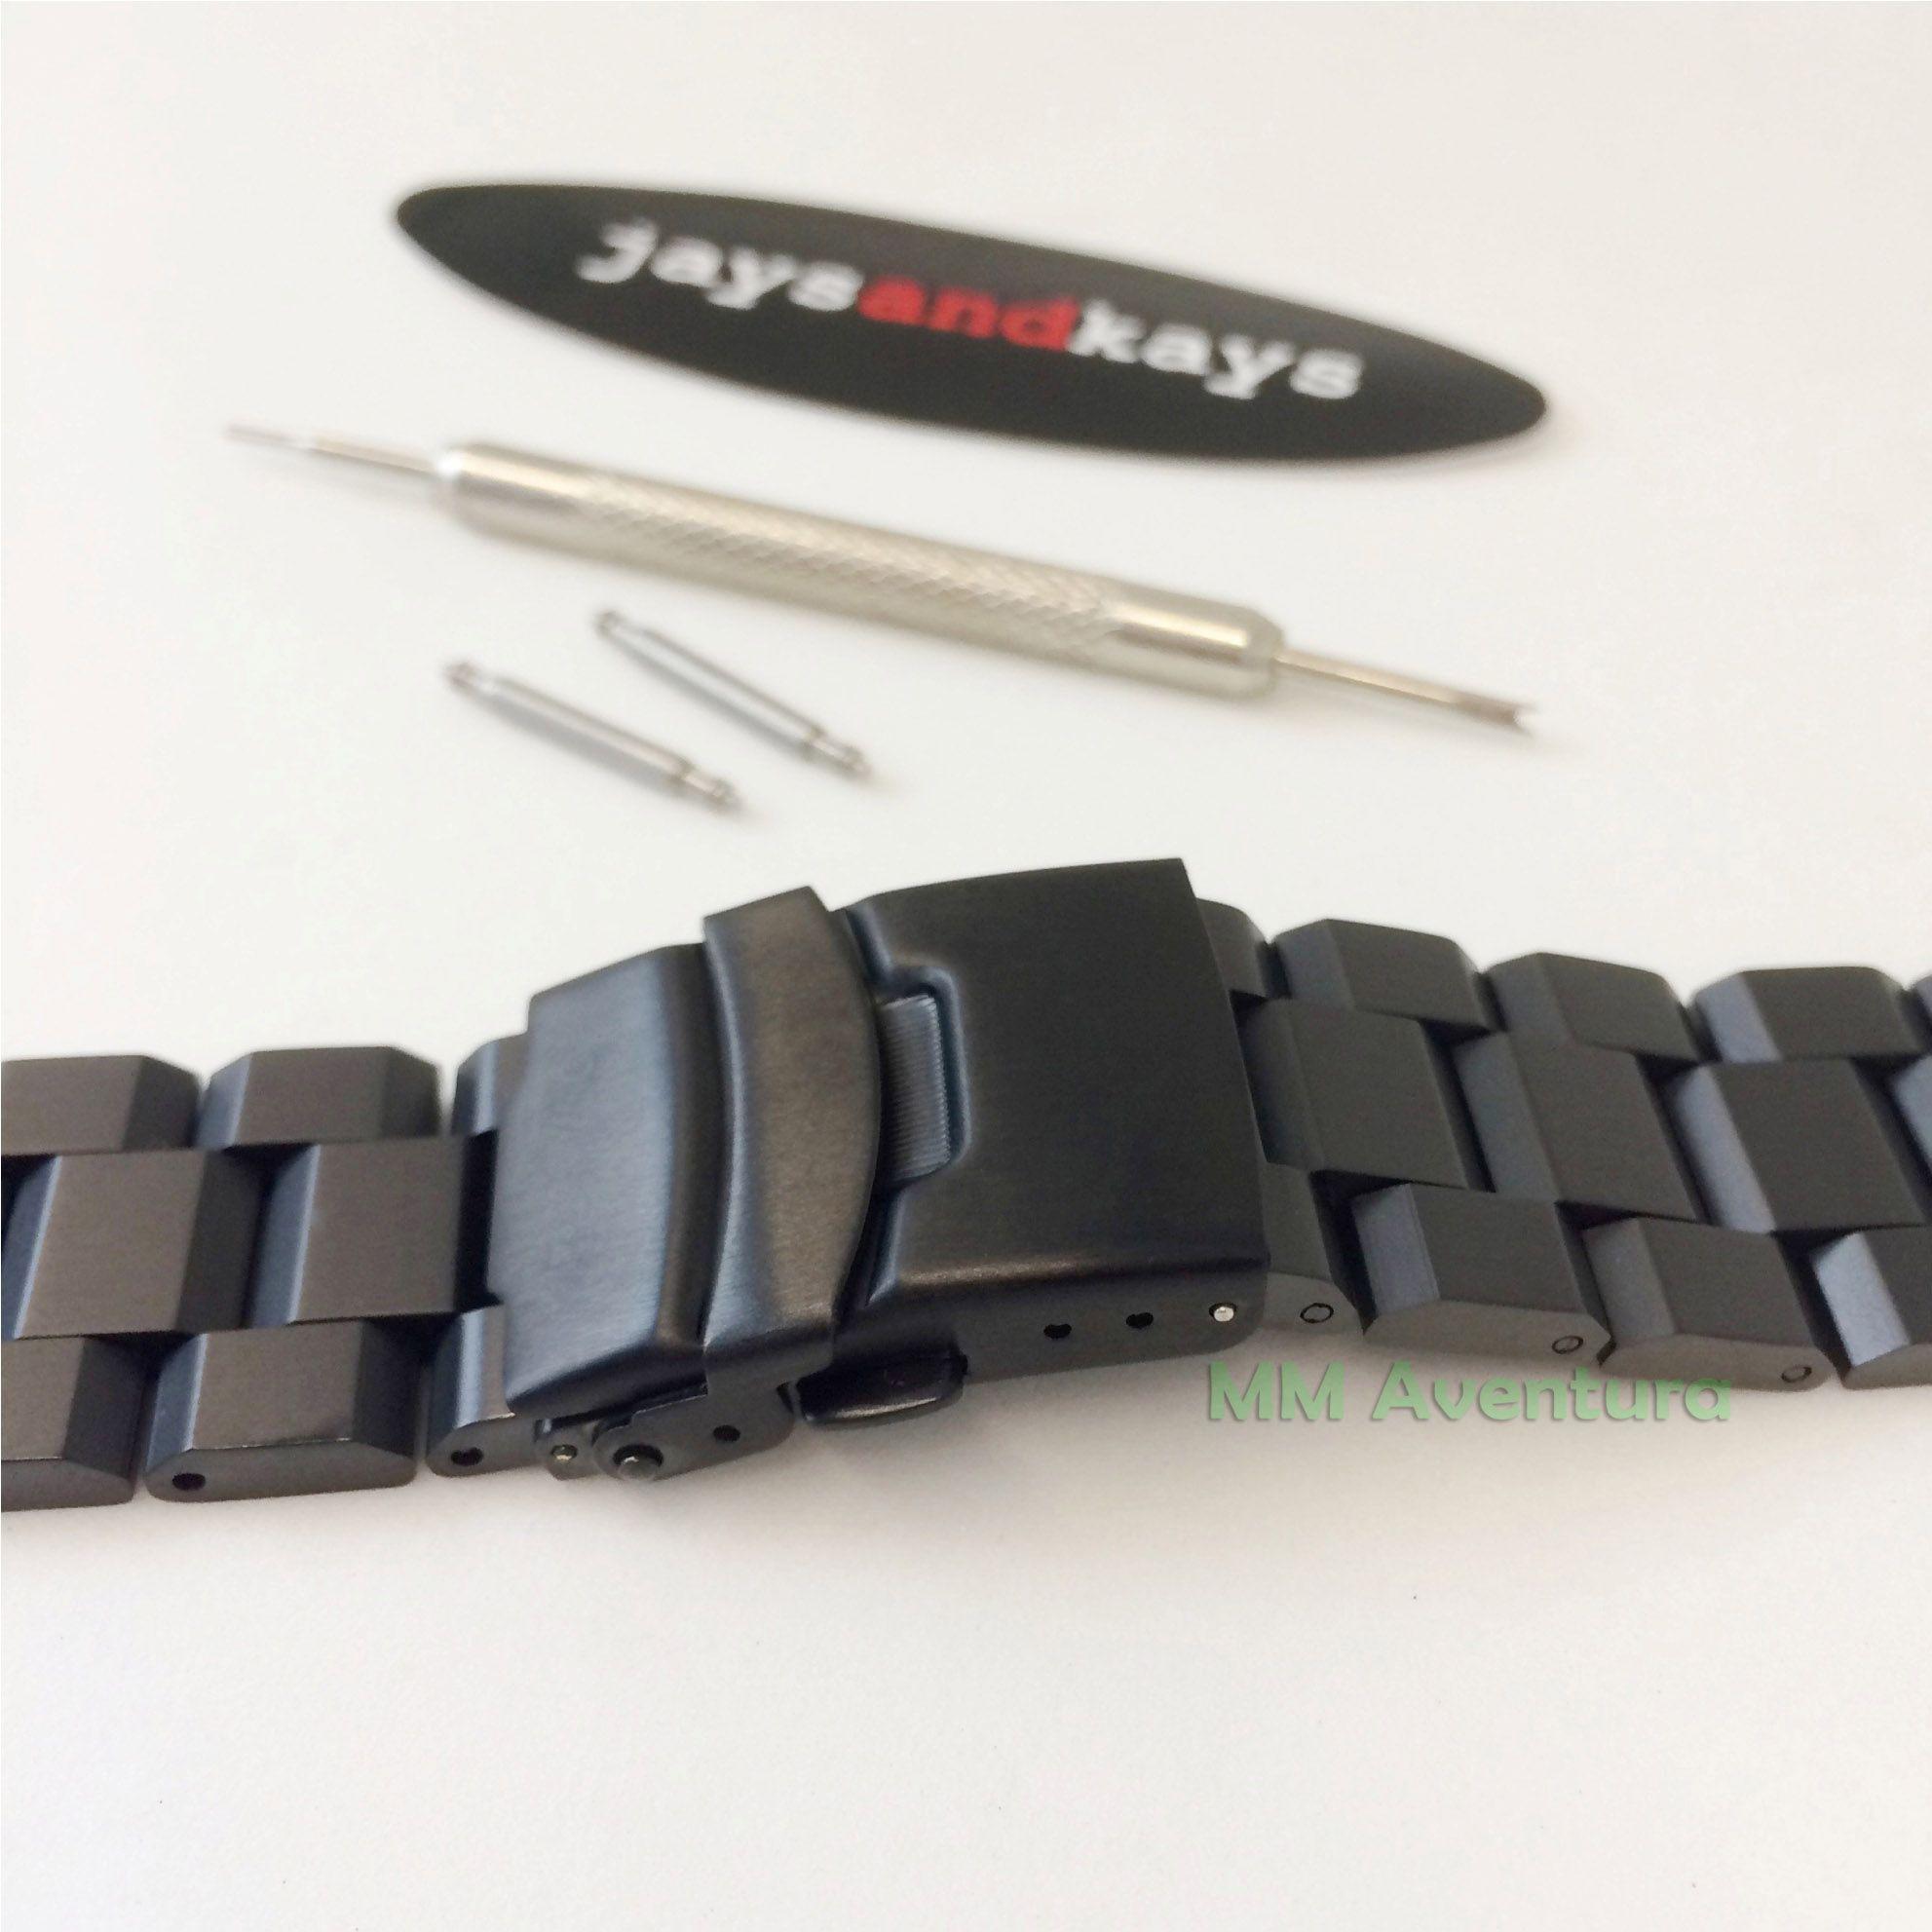 Pulseira em Aço Inox JaysAndKays p/ G-Shock 22mm GX56 GD350 etc